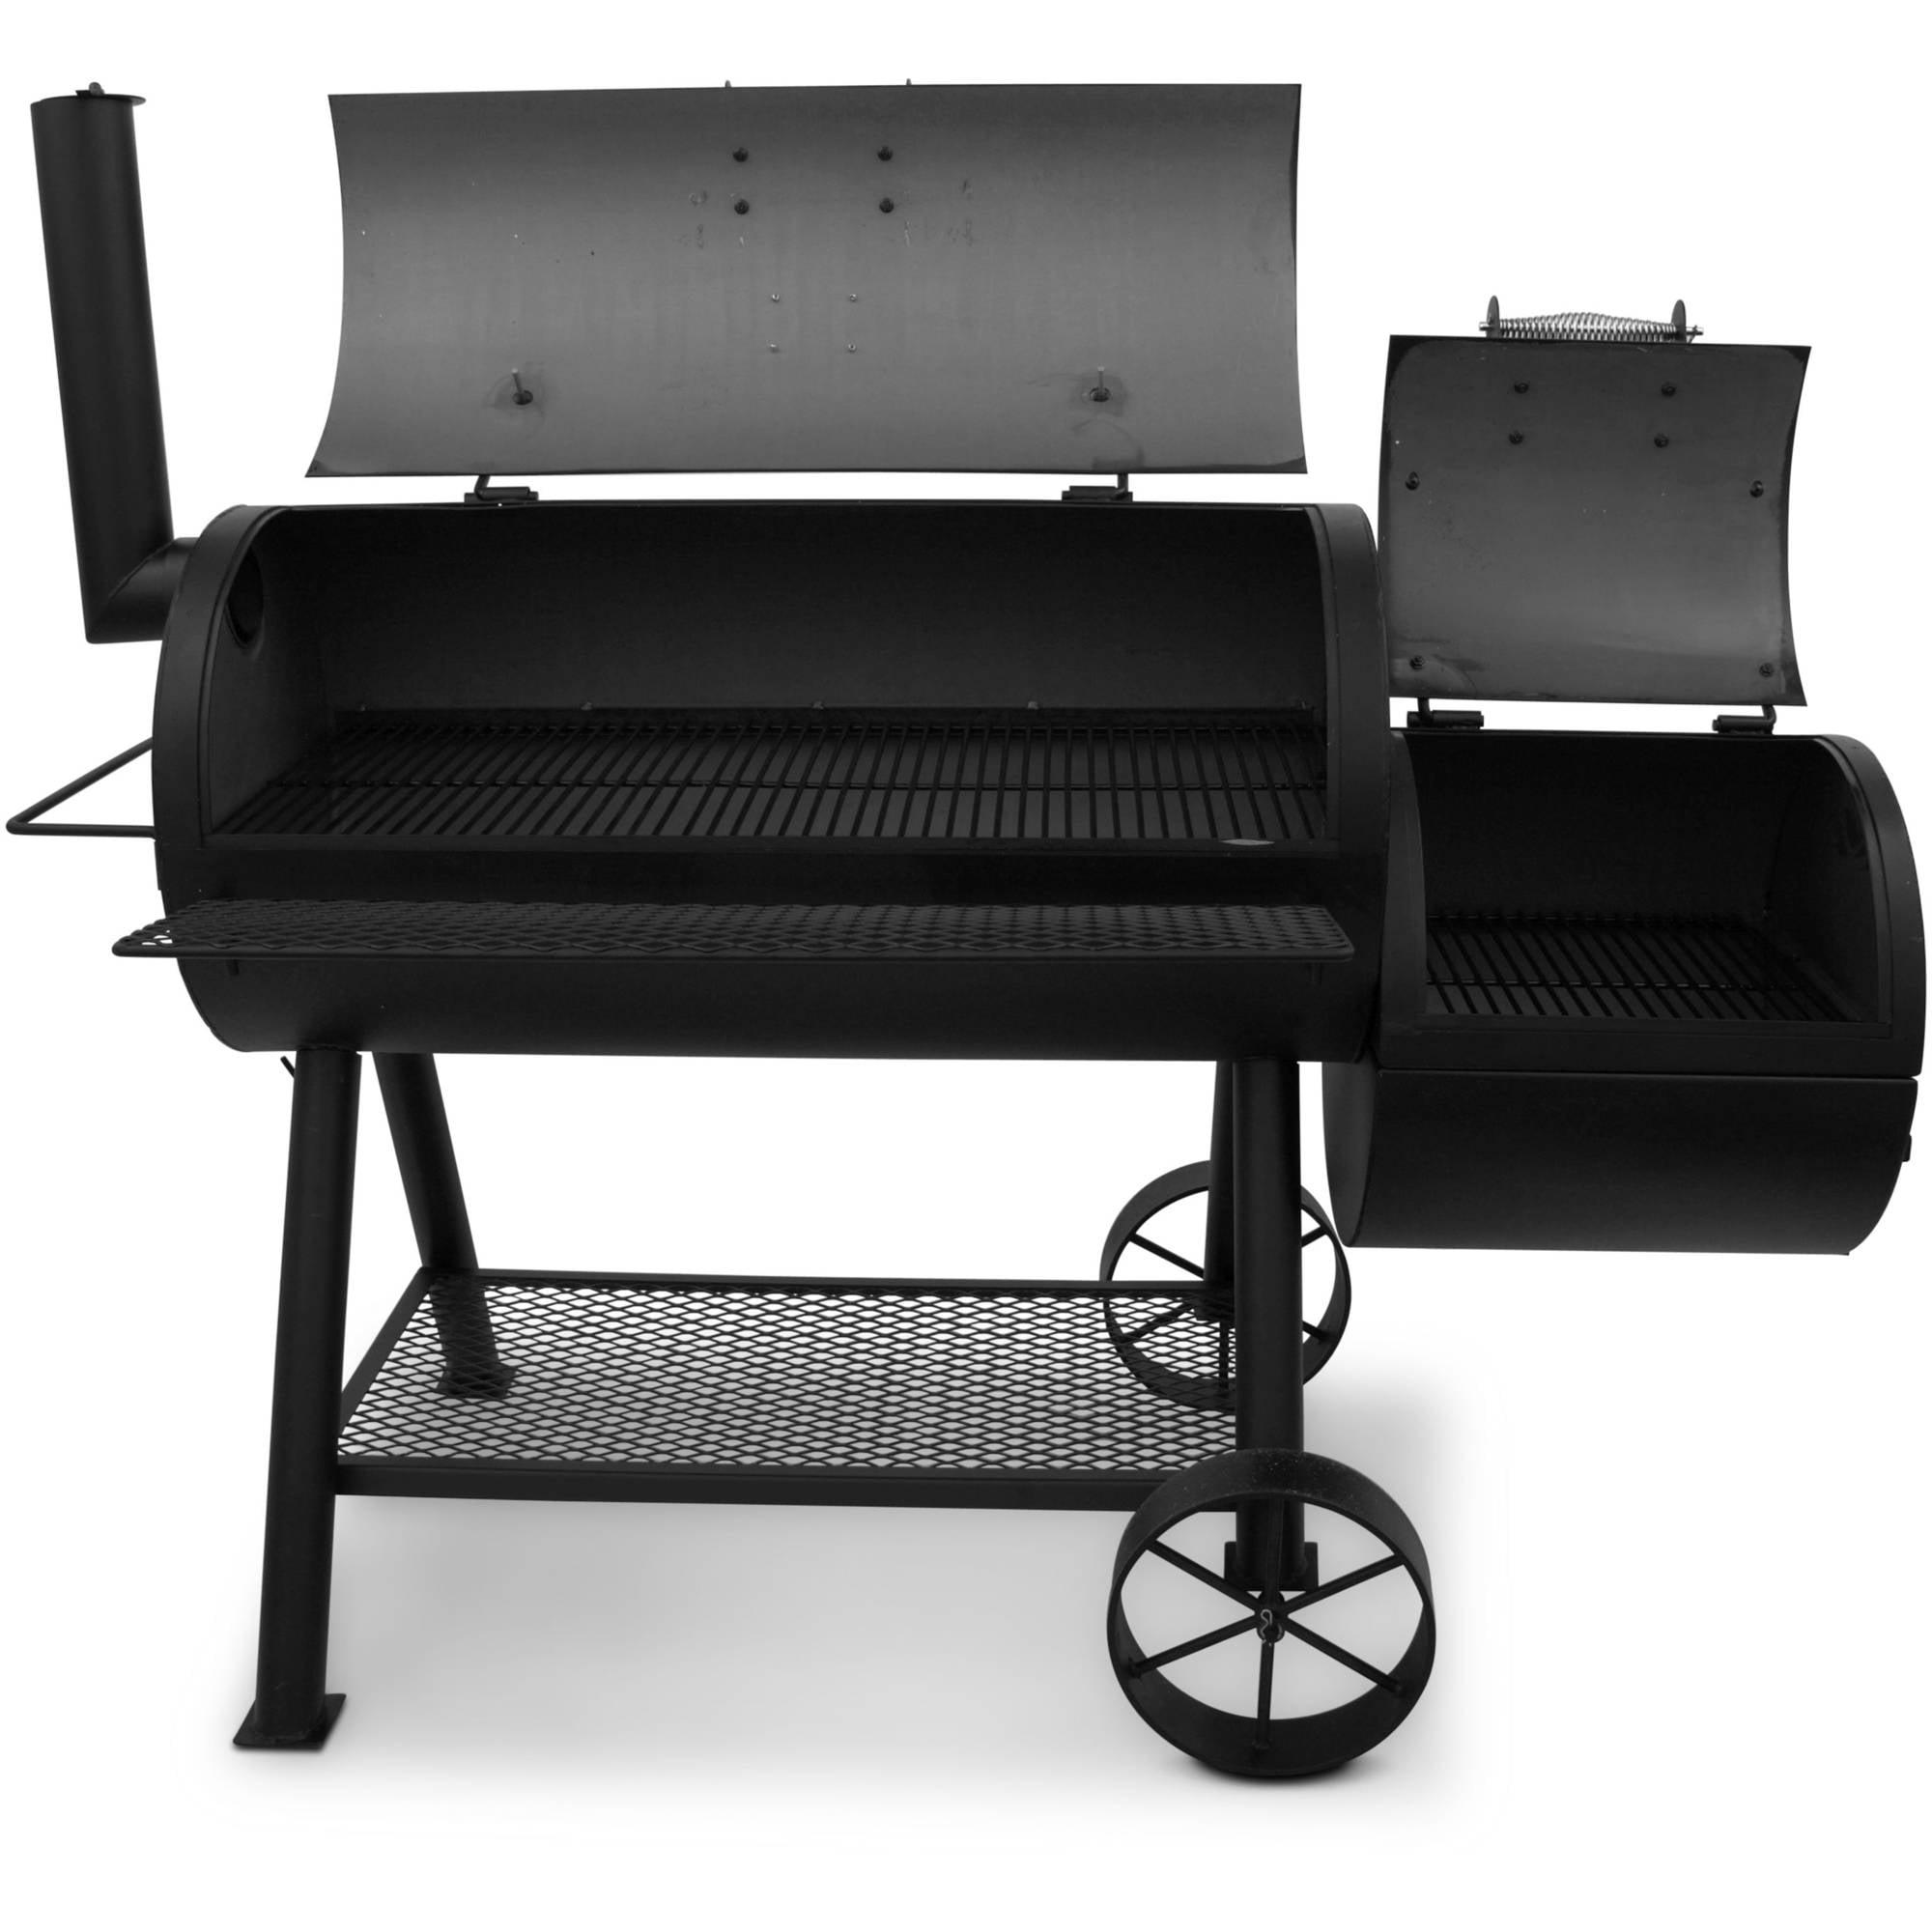 100 brinkmann grills dual function charcoal gas grills. Black Bedroom Furniture Sets. Home Design Ideas